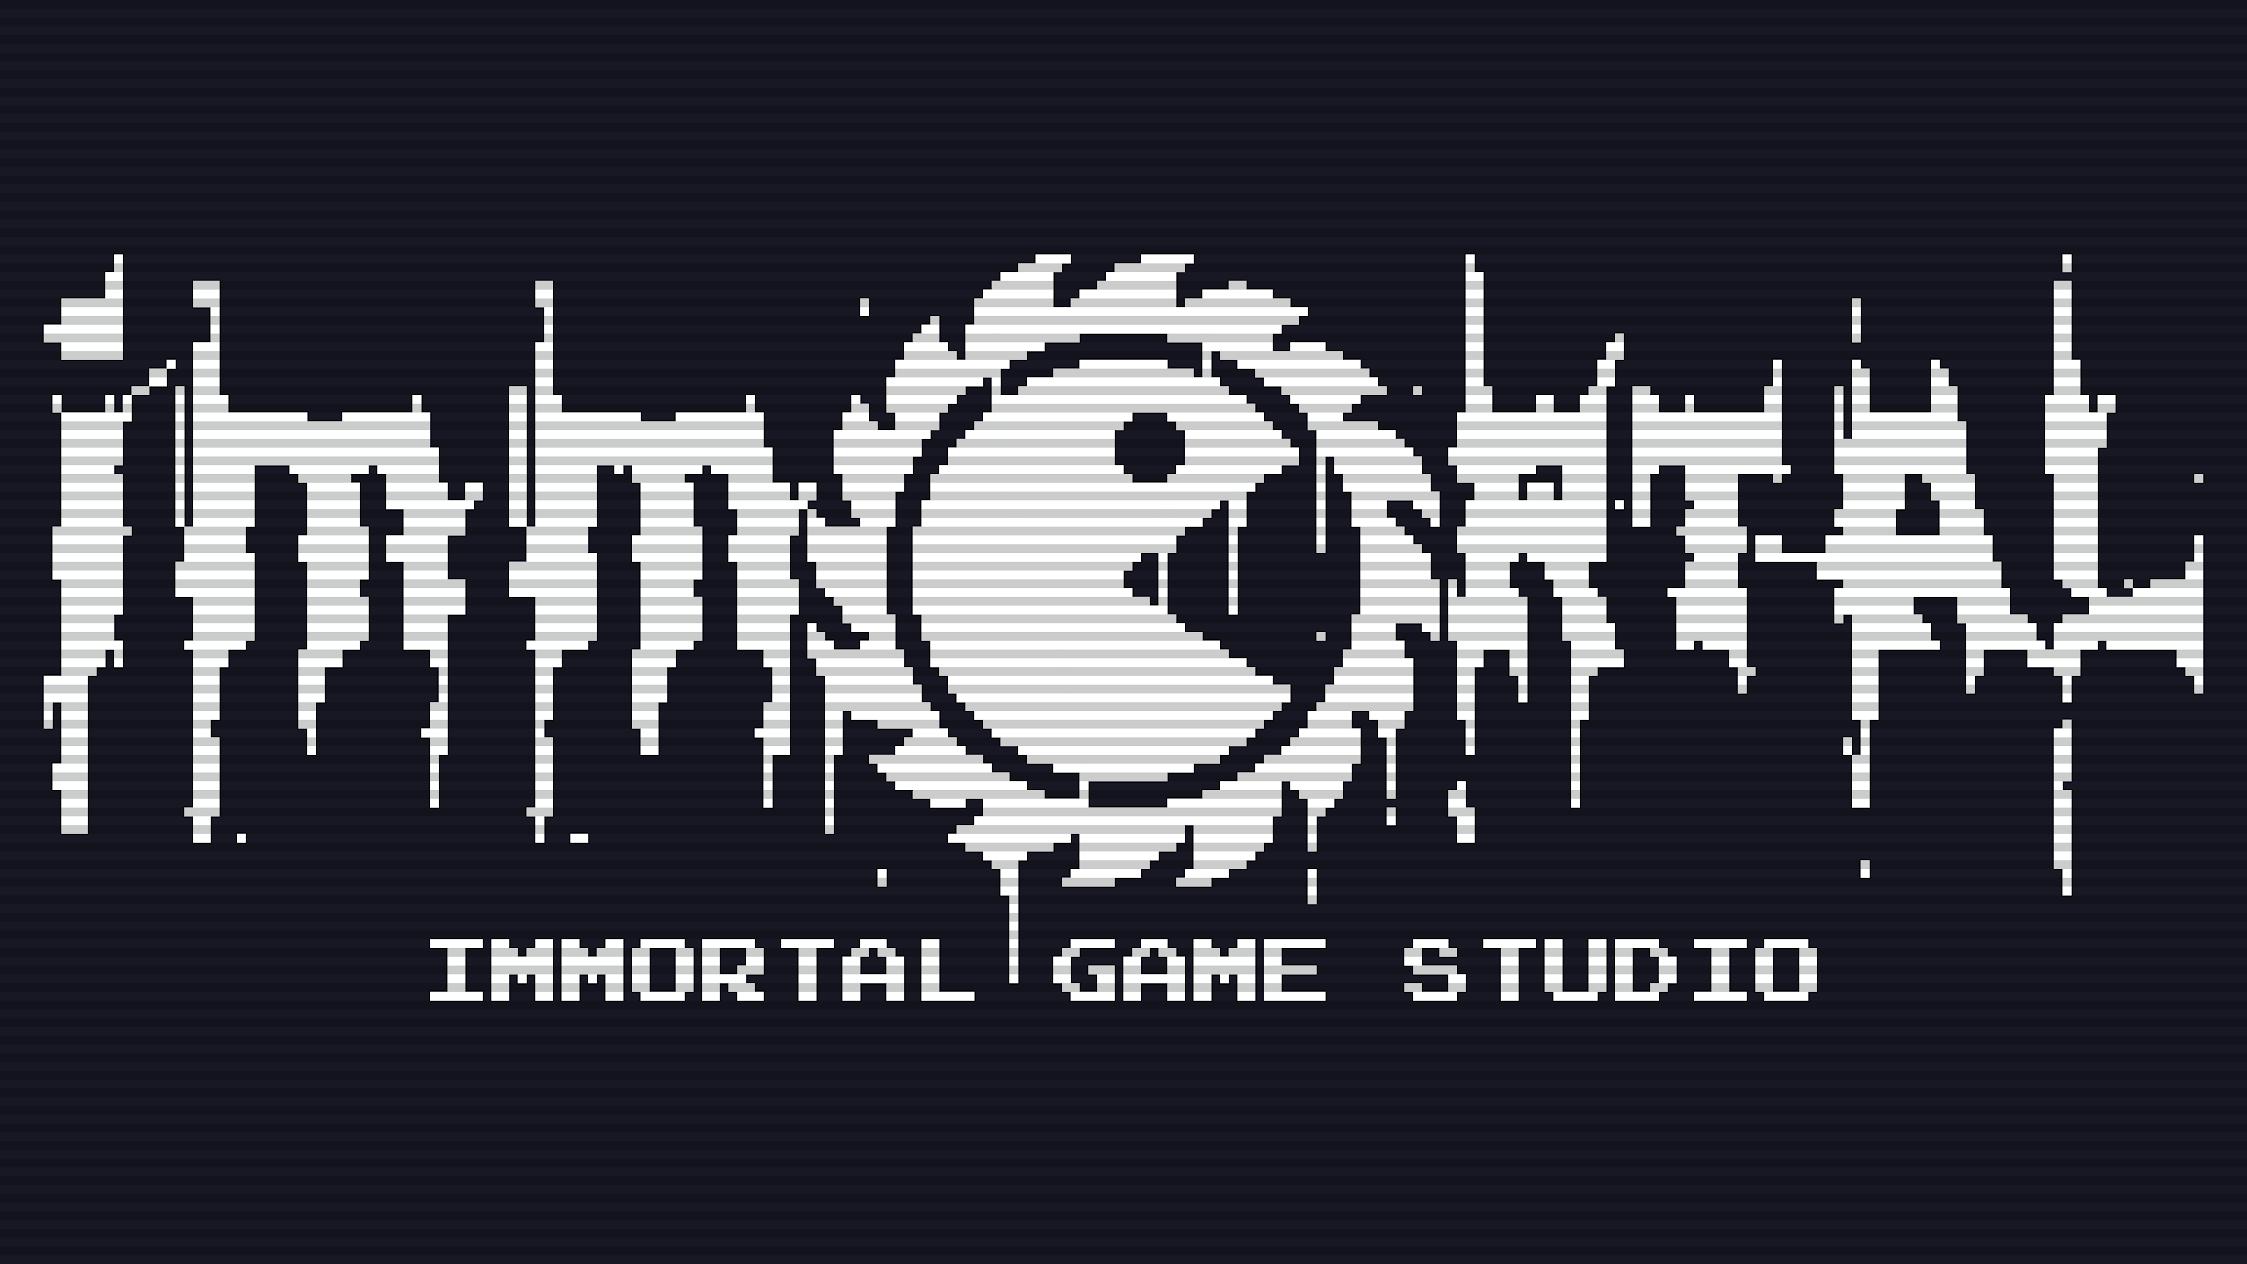 IMMORTAL GAME STUDIO